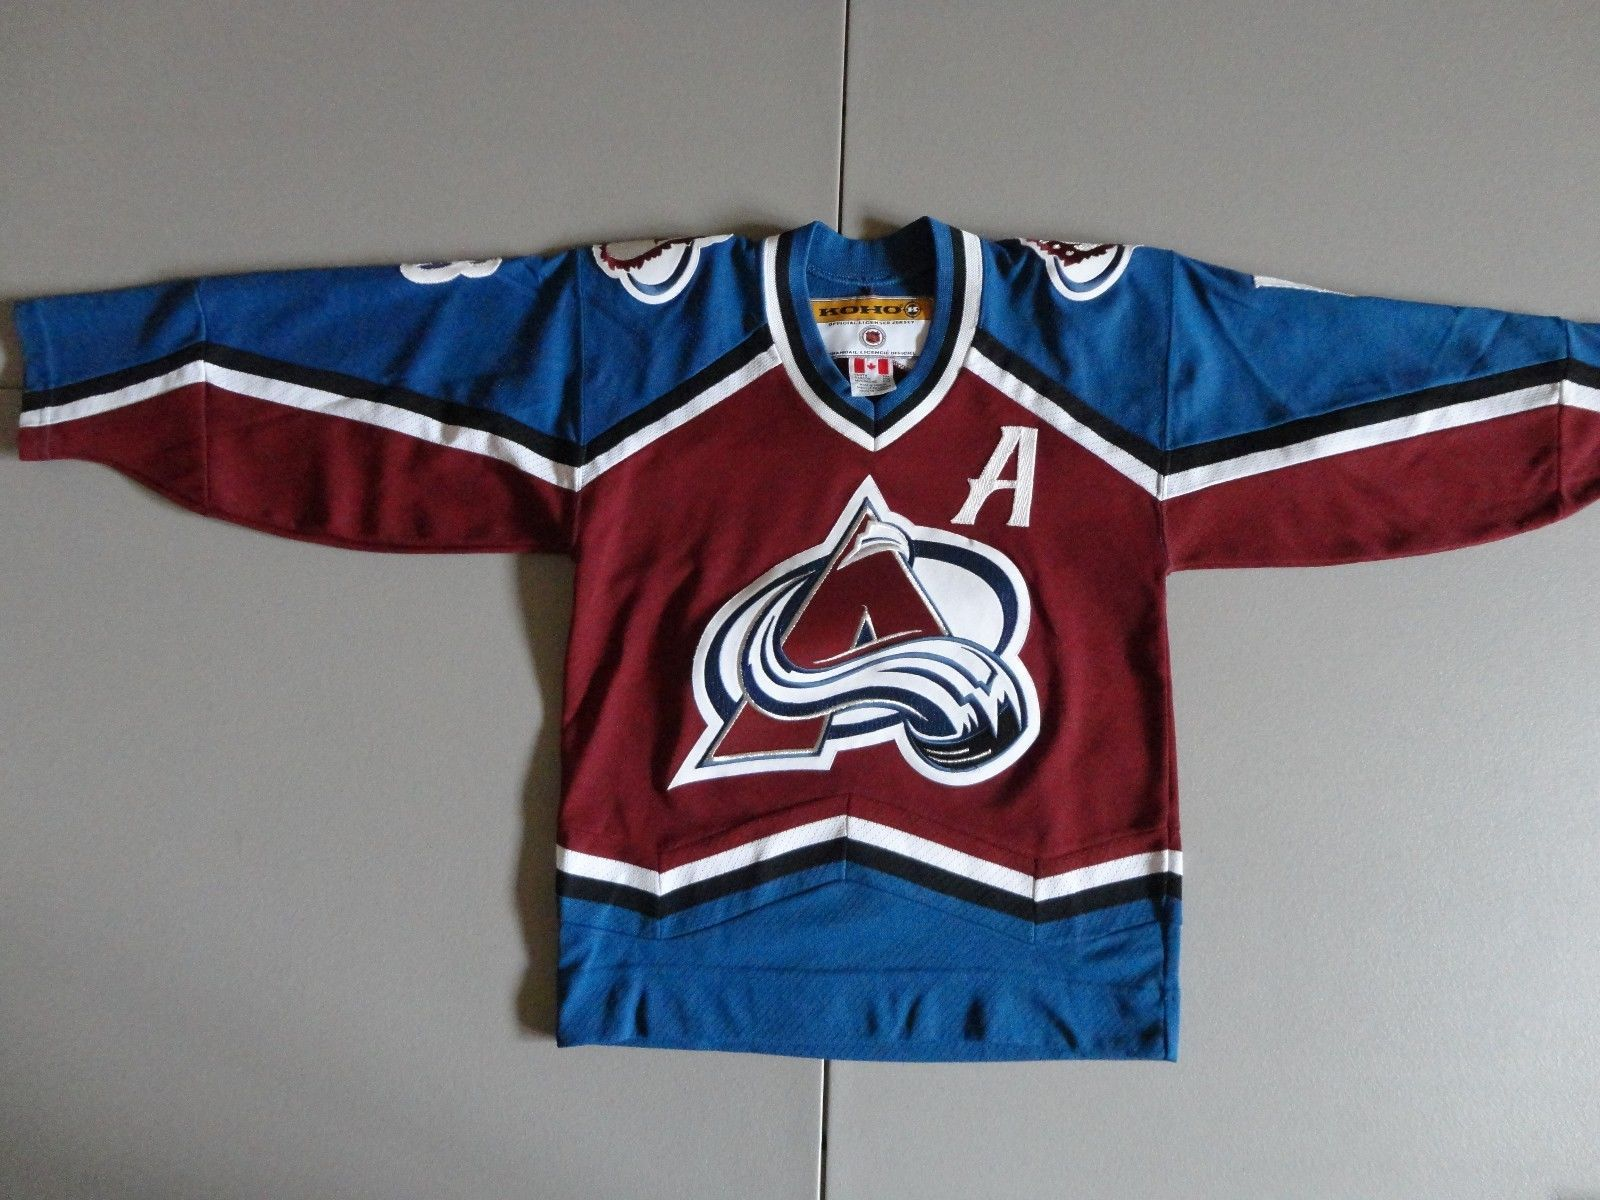 8b58b5685 S l1600. S l1600. Koho Colorado Avalanche  18 Draucker NHL Hockey SEWN Jersey  Youth S M EXCELLENT ...